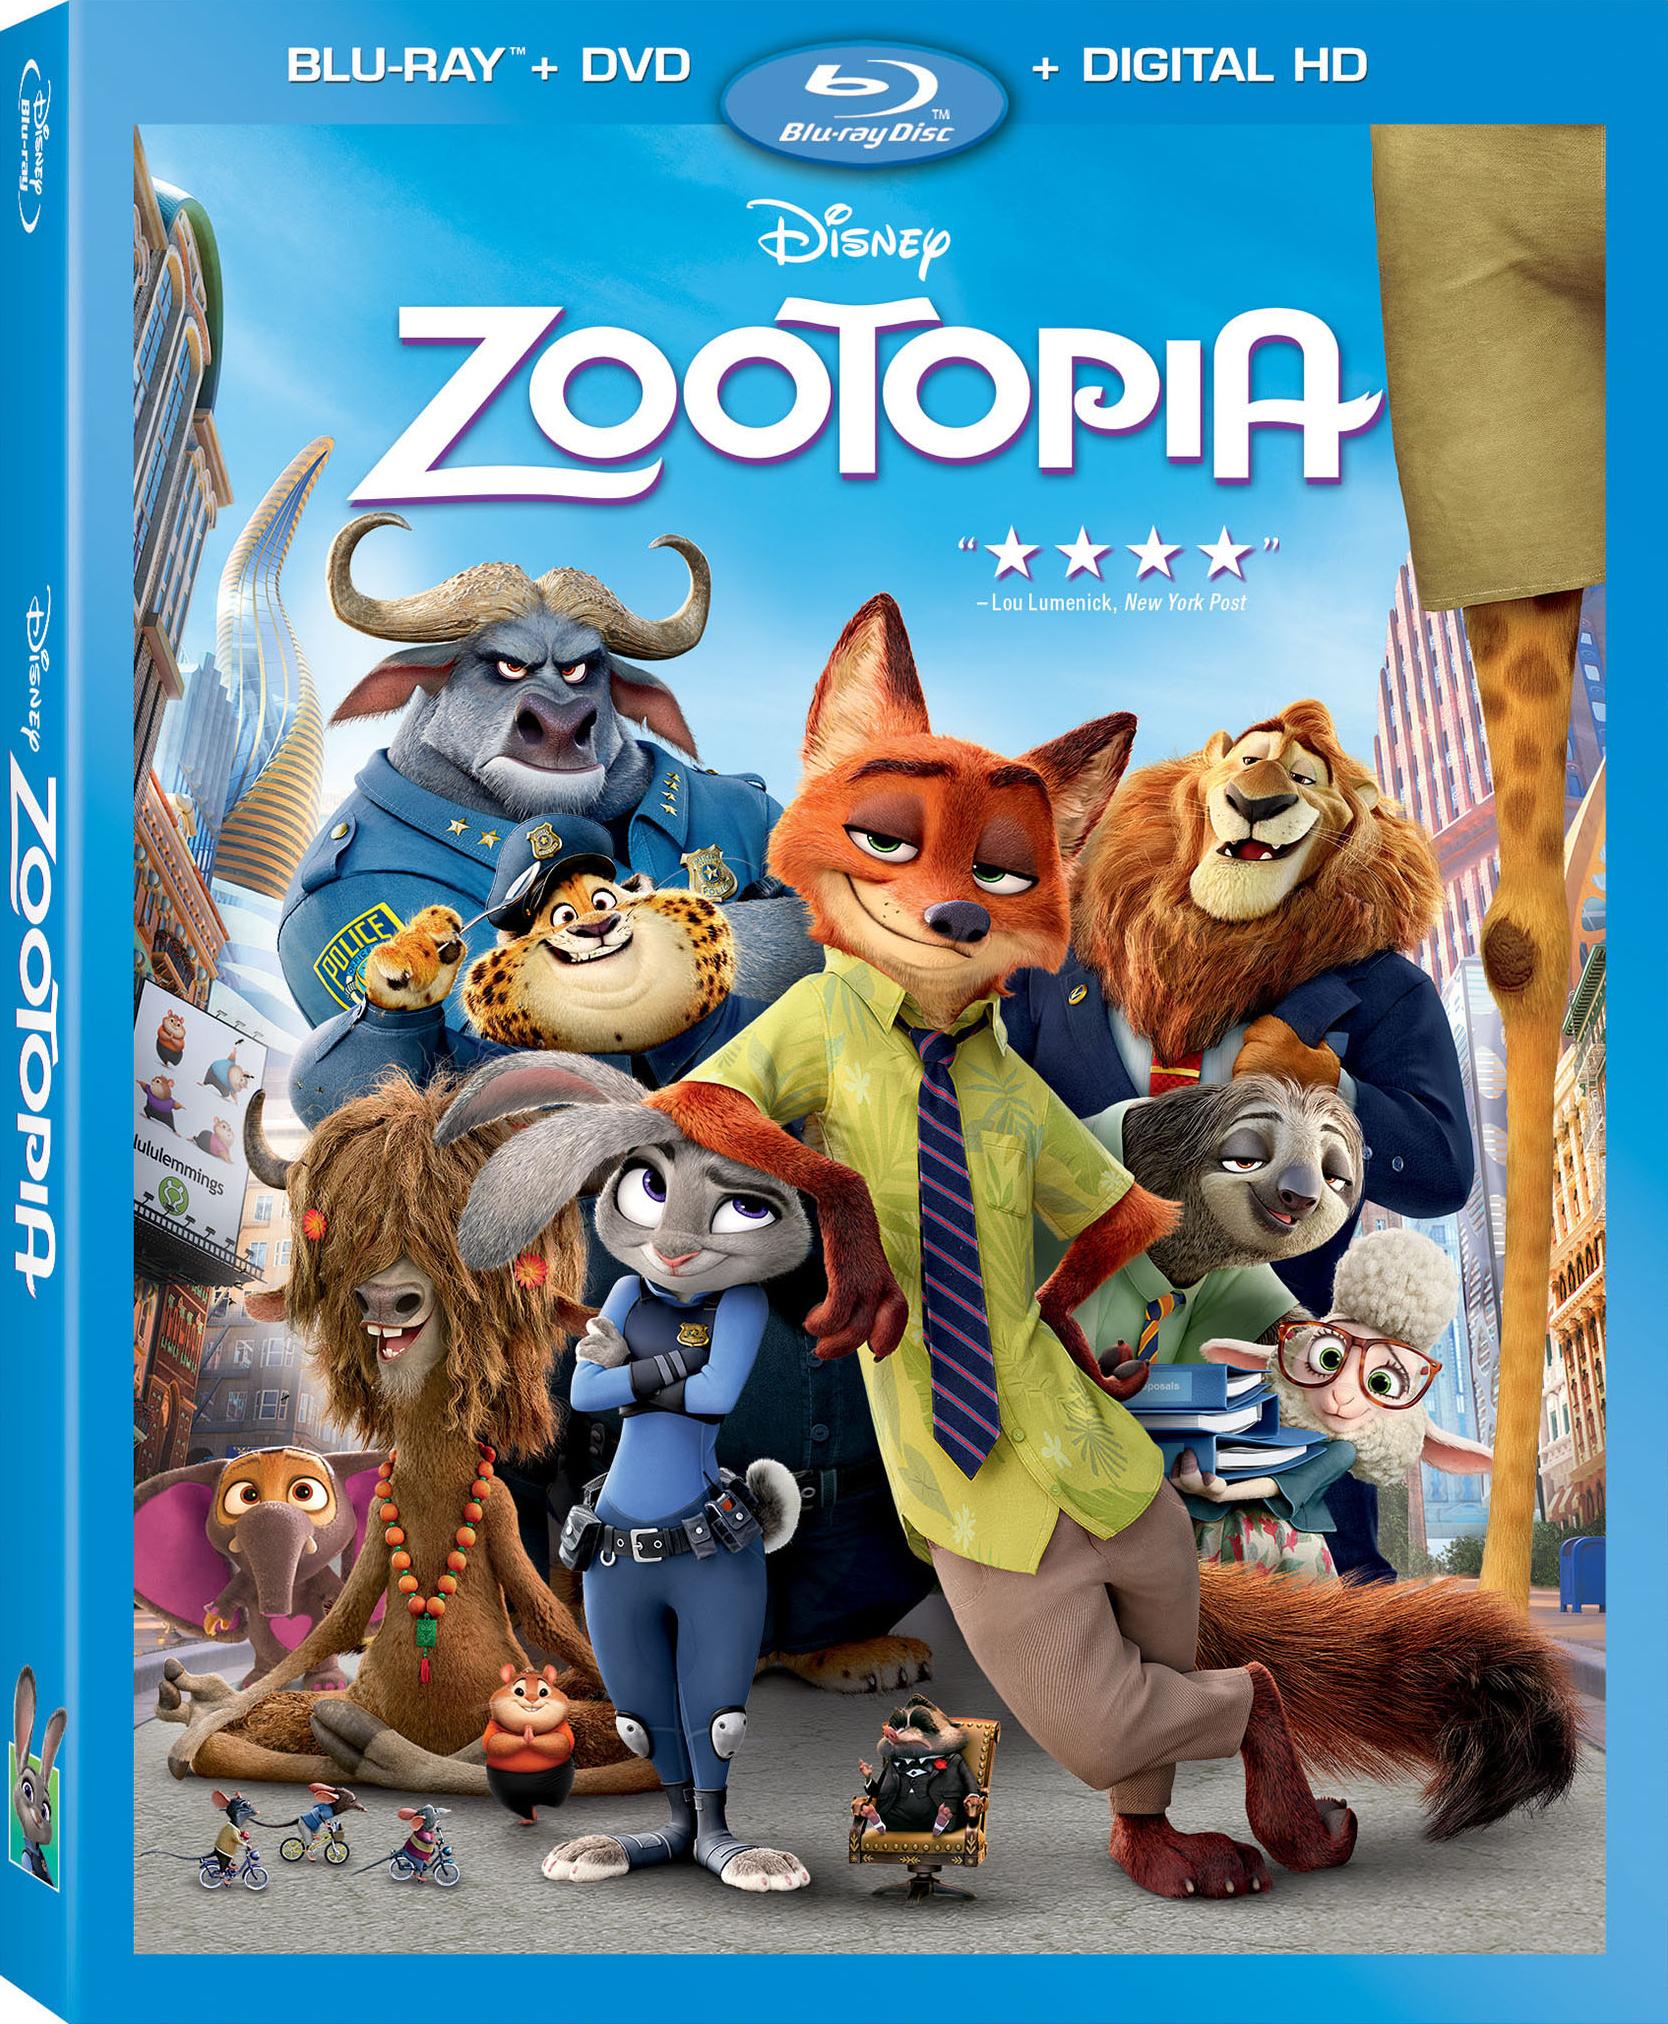 Zootopia (2016) poster image